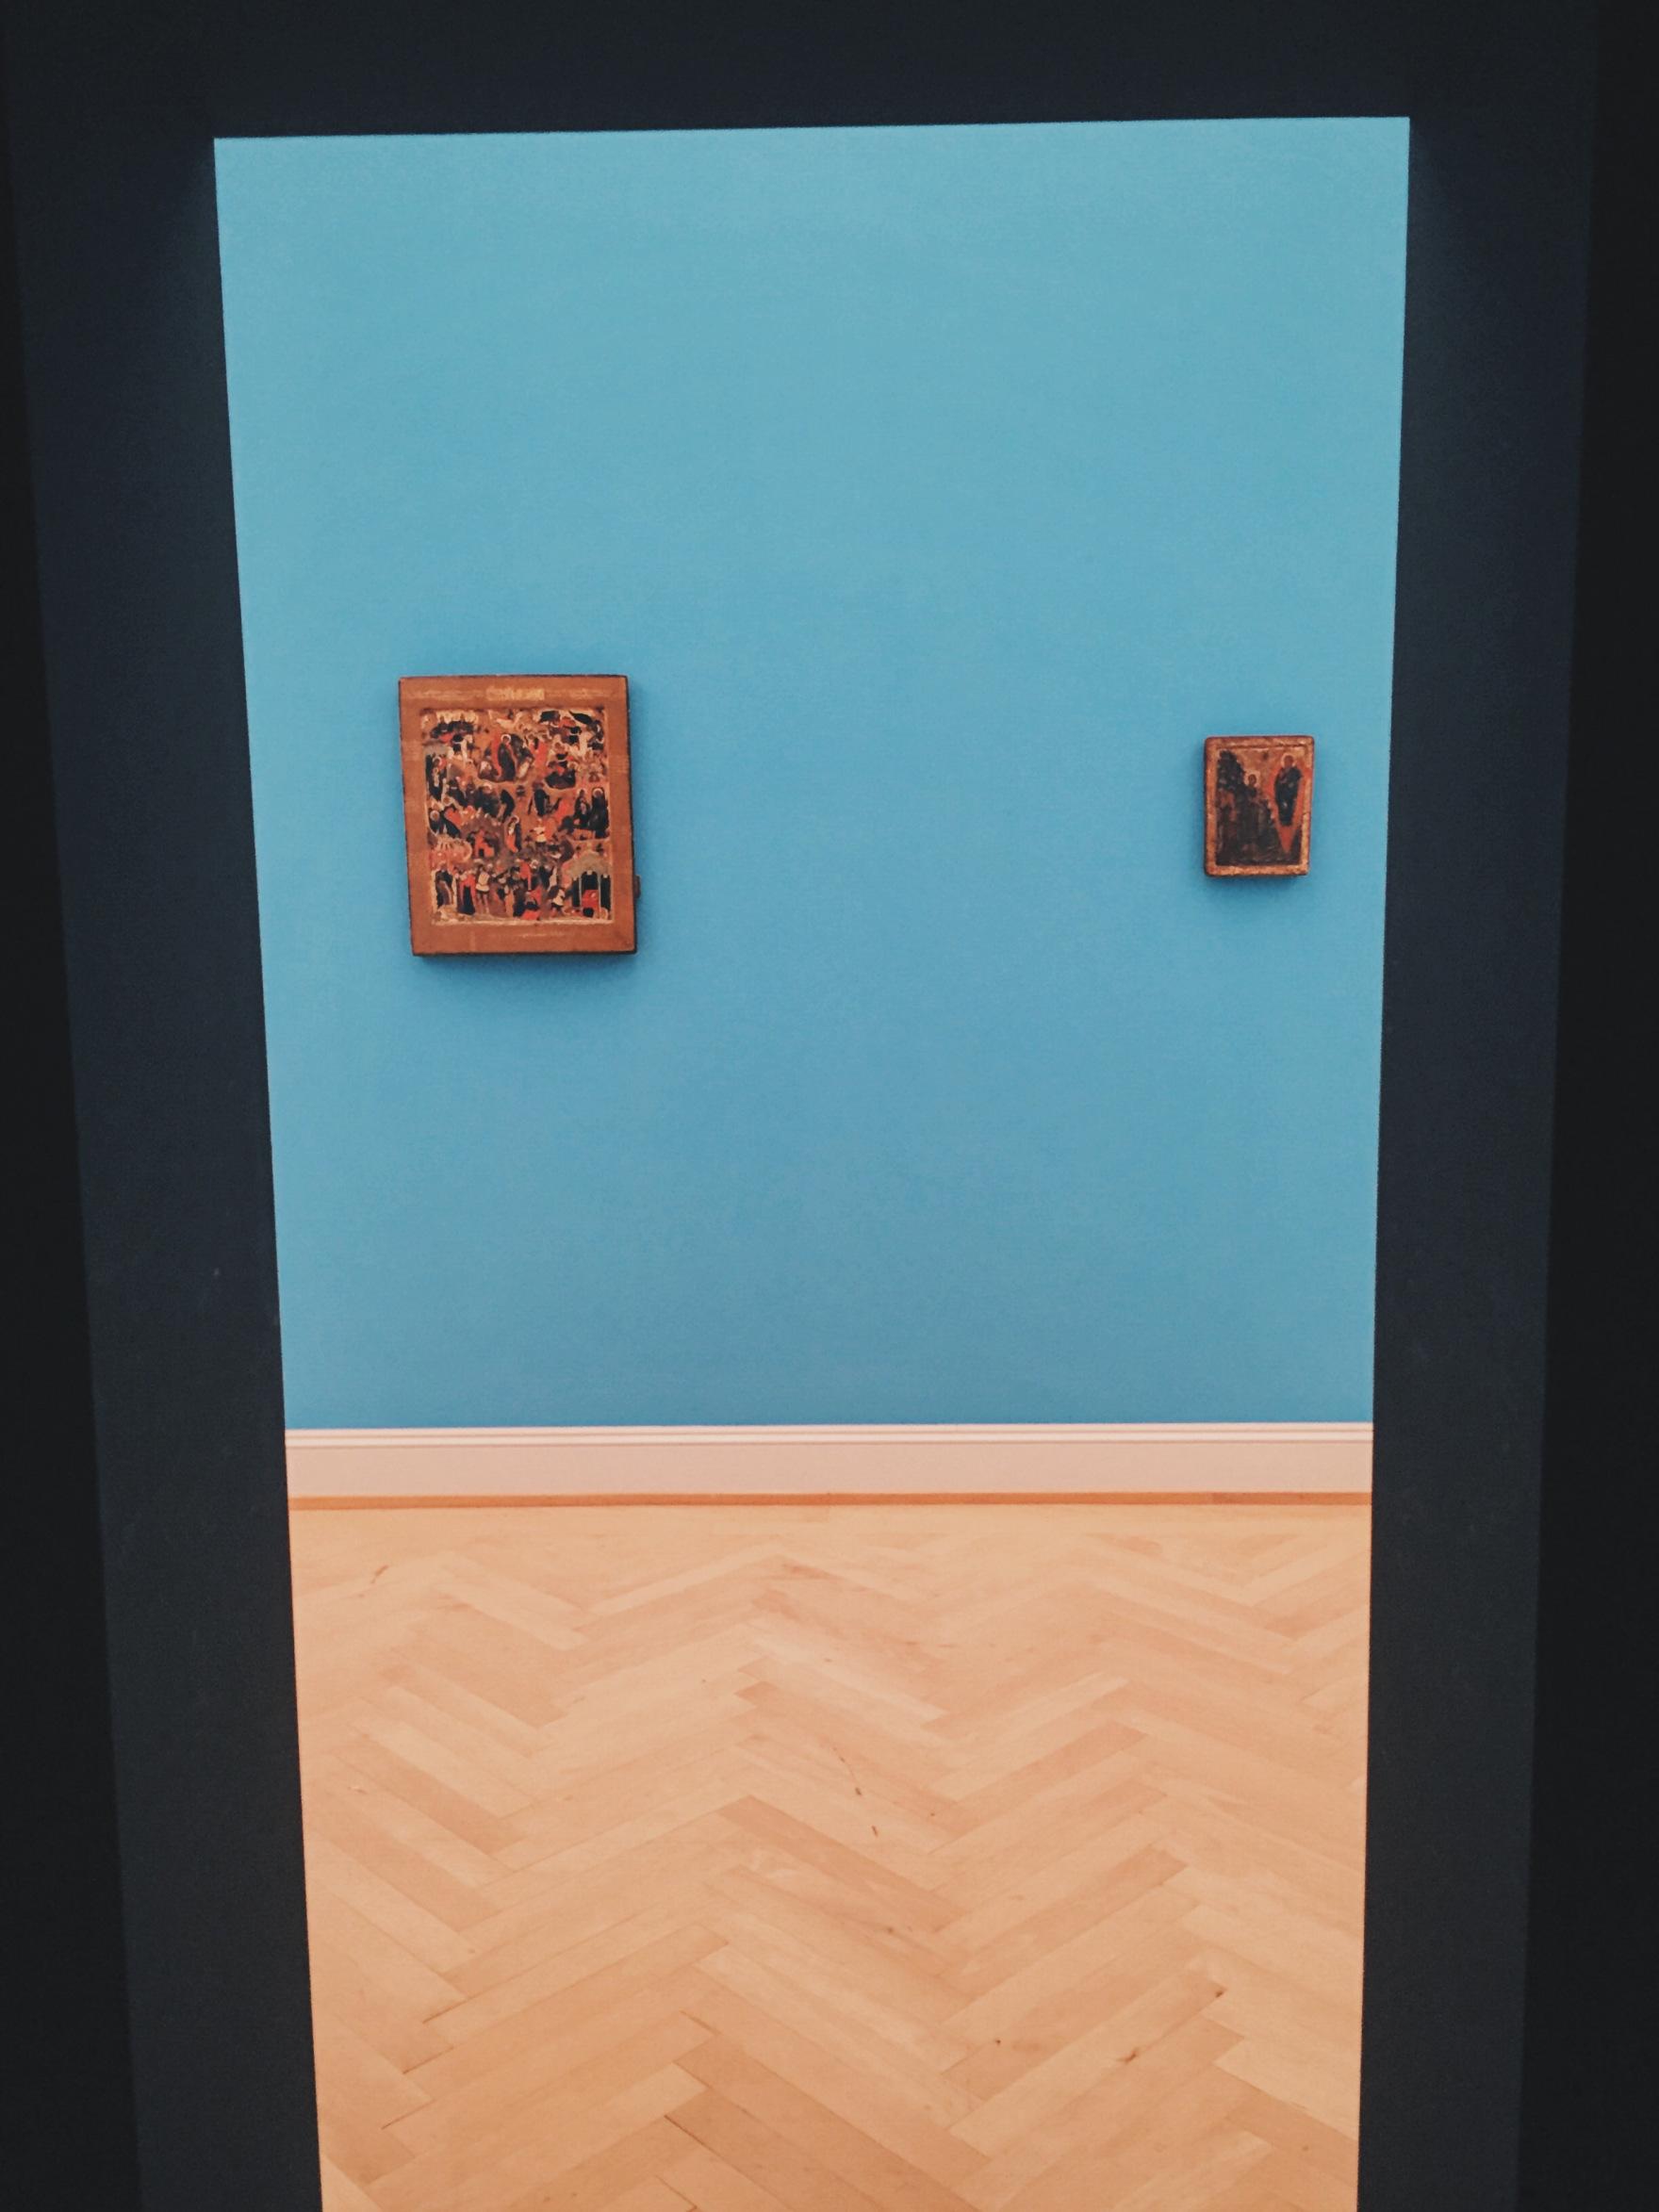 A Peculiar Exhibit